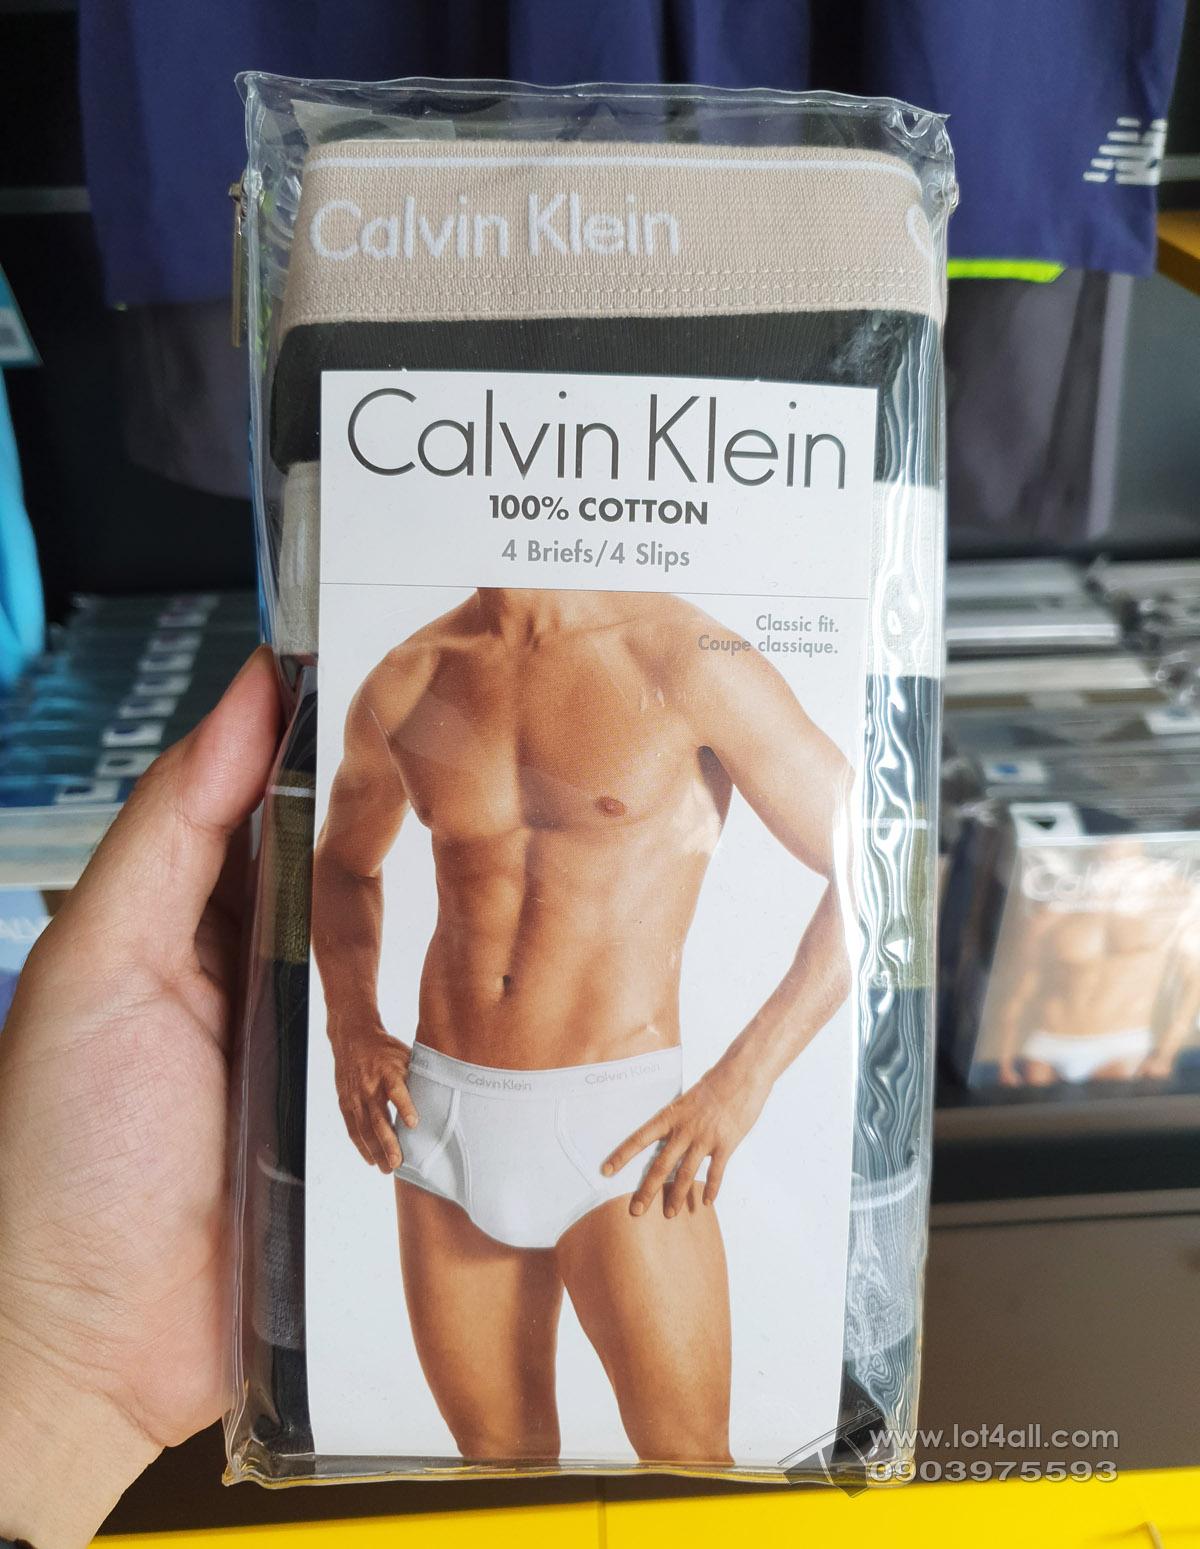 Quần lót Calvin Klein U4000-098 Cotton Classic Brief 4-pack Black